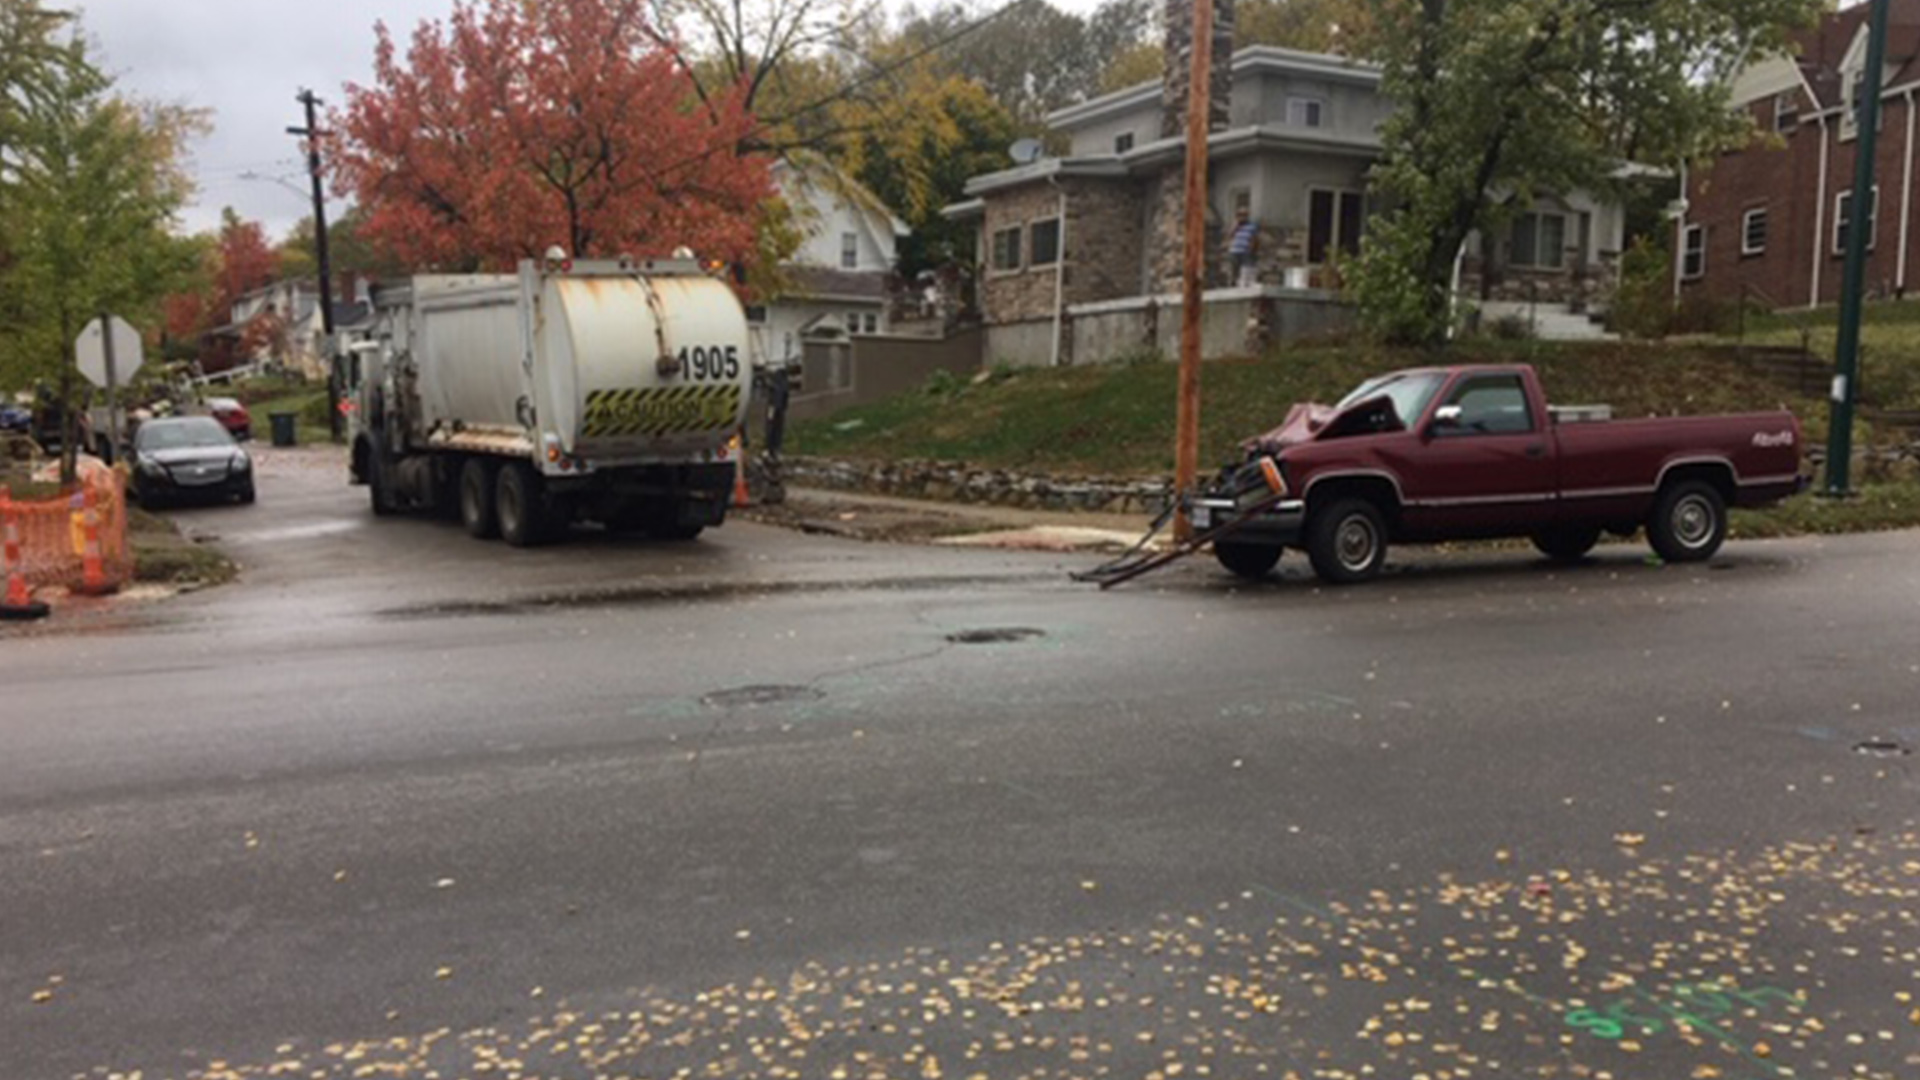 Truck v Trash Truck